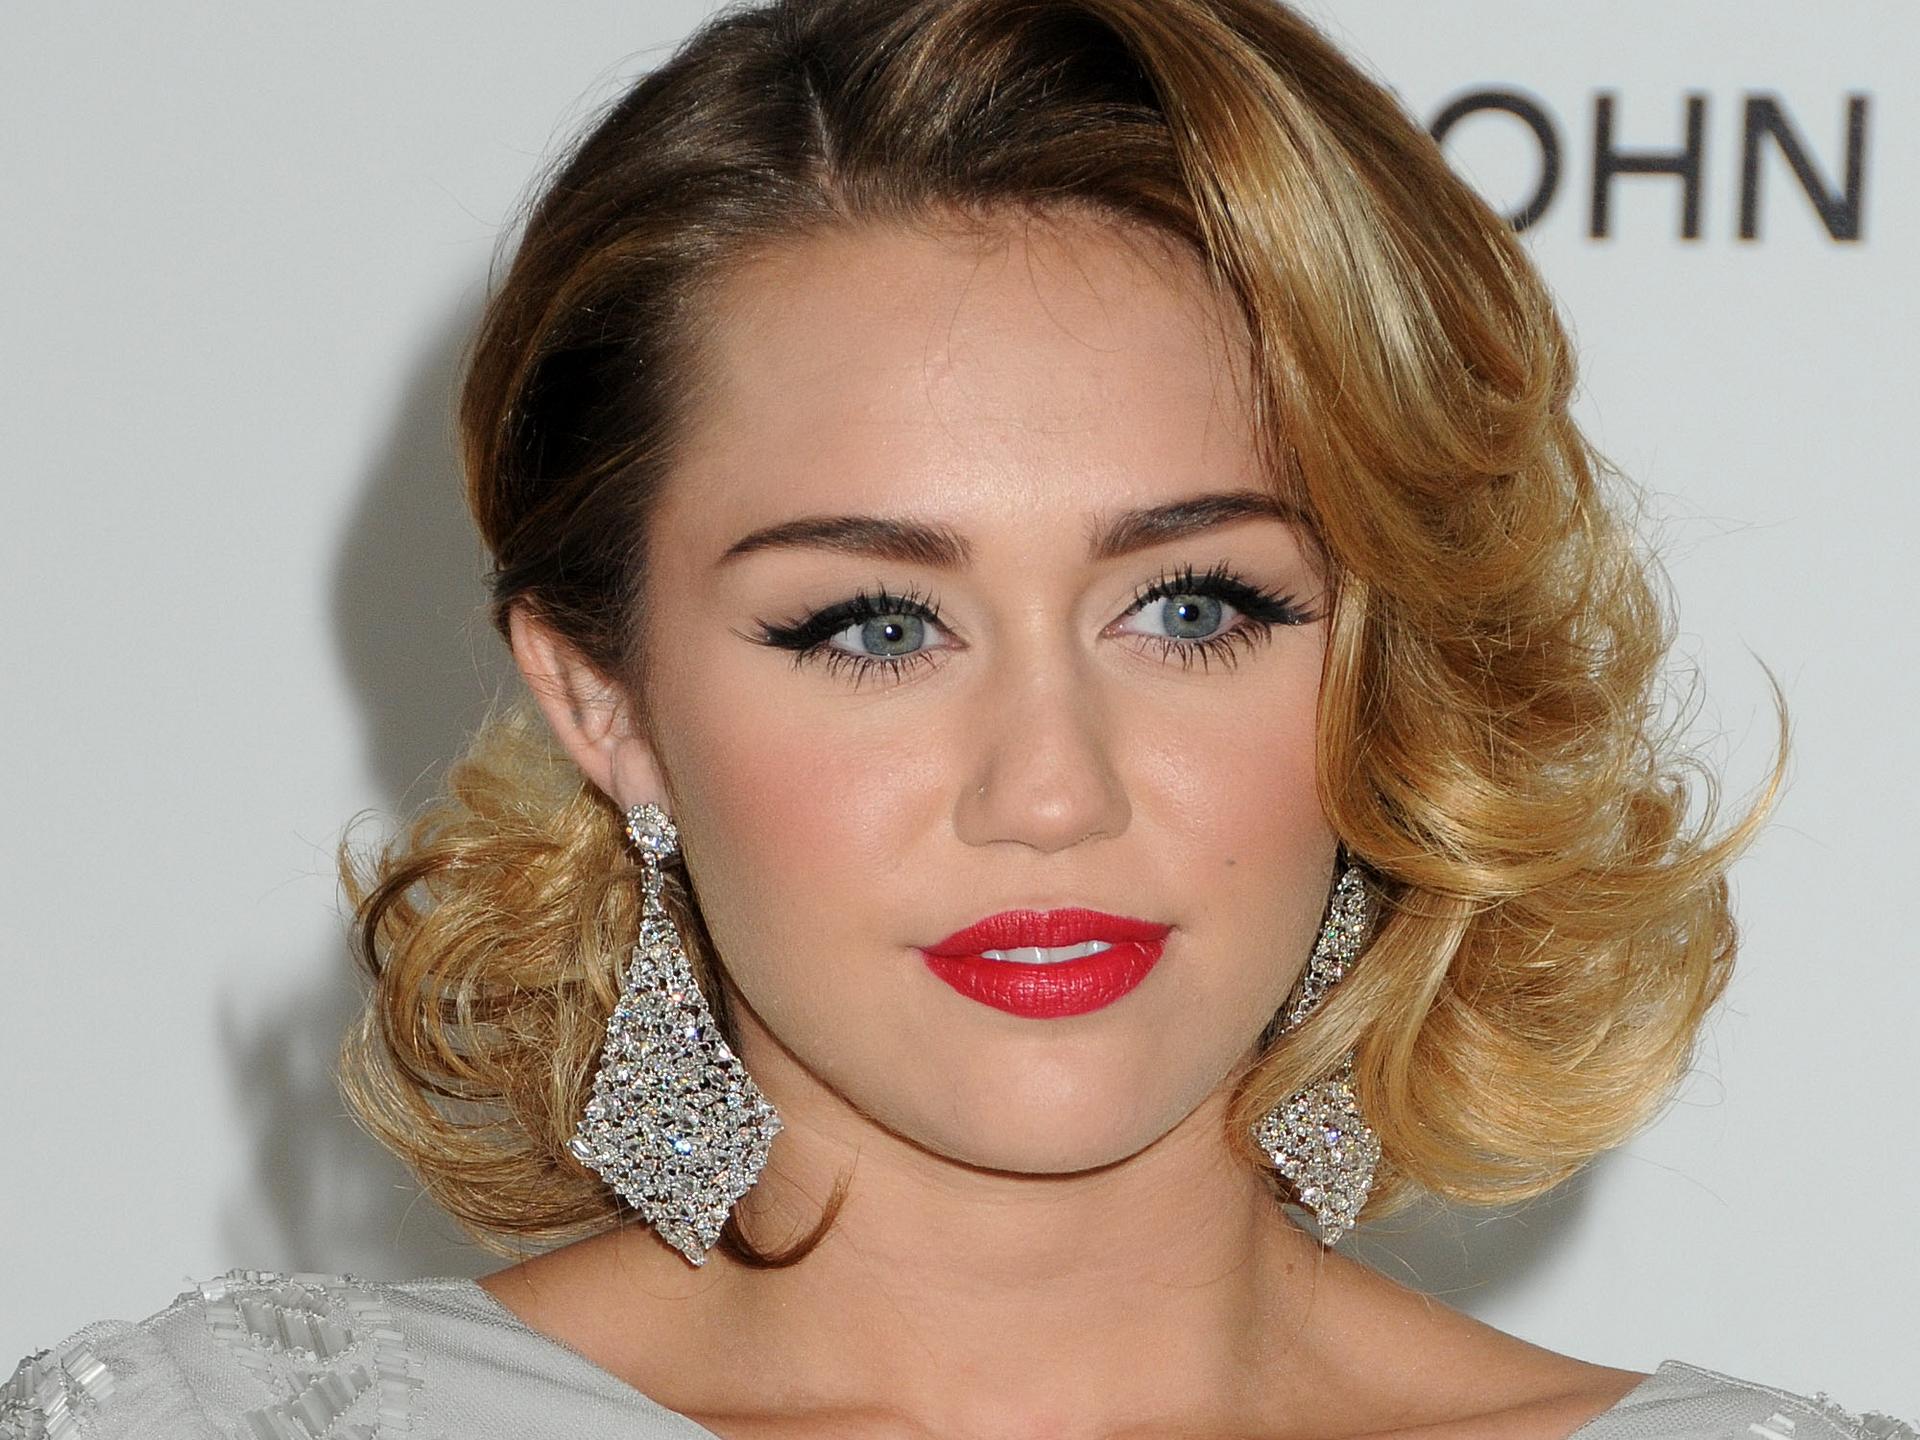 Miley Cyrus / マイリー・サイラス